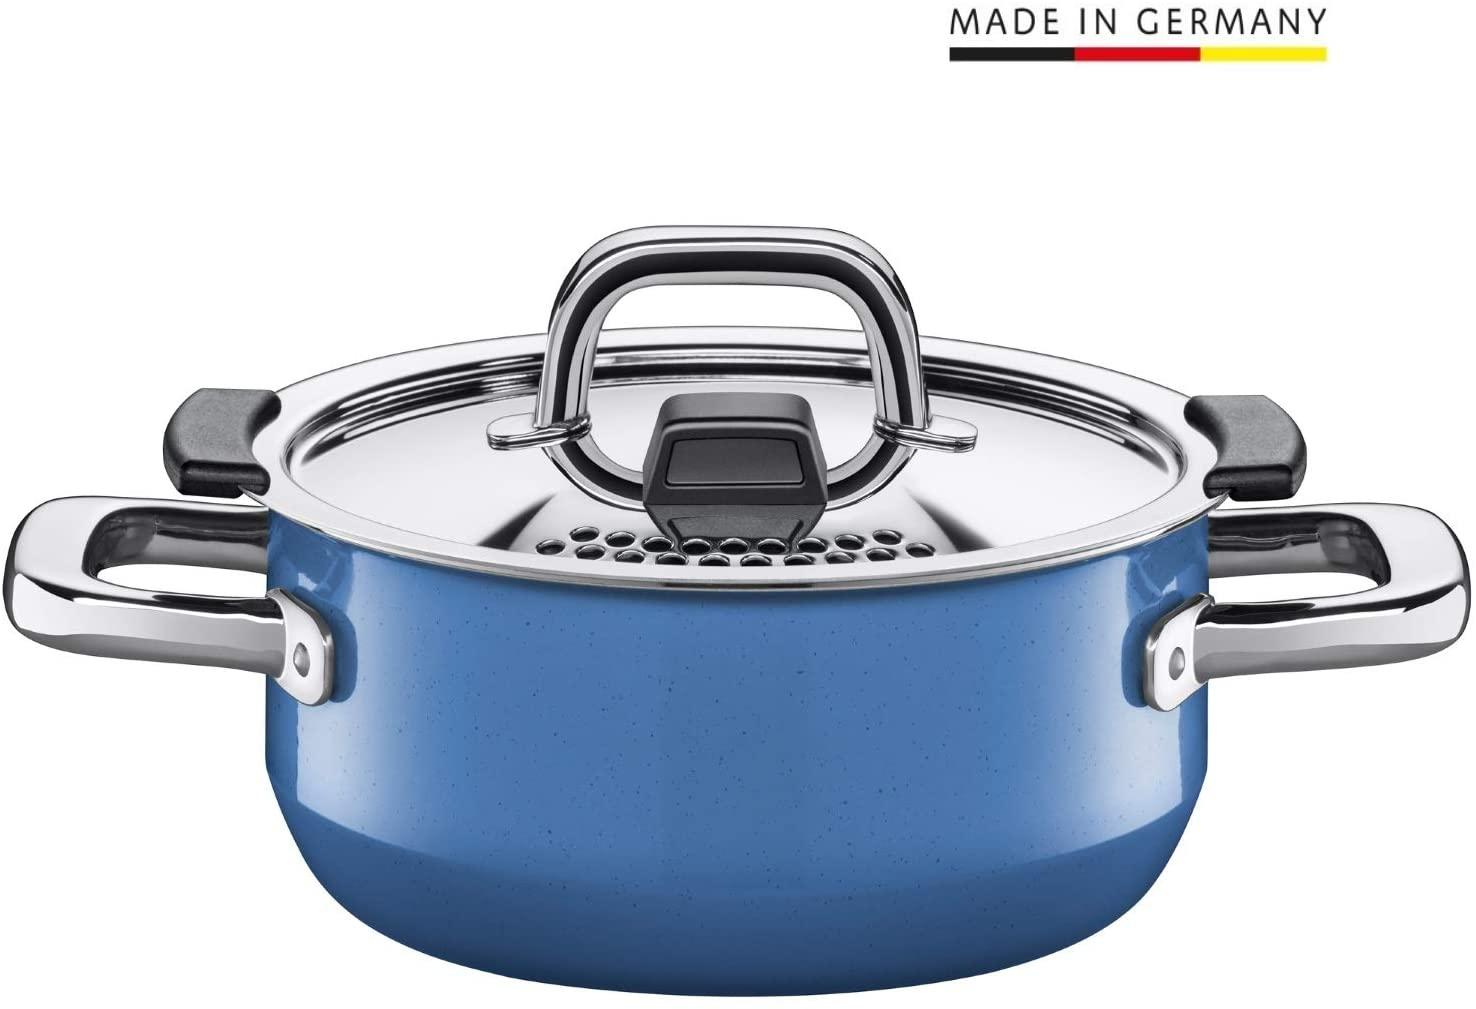 WMF-Sammeldeal: z.B. Silit Nature Blue Bratentopf 16cm - 59,95€   WMF Kinderbesteck-Set Janosch - 24,95€   WMF Moto Salatschüssel-Set - 25€